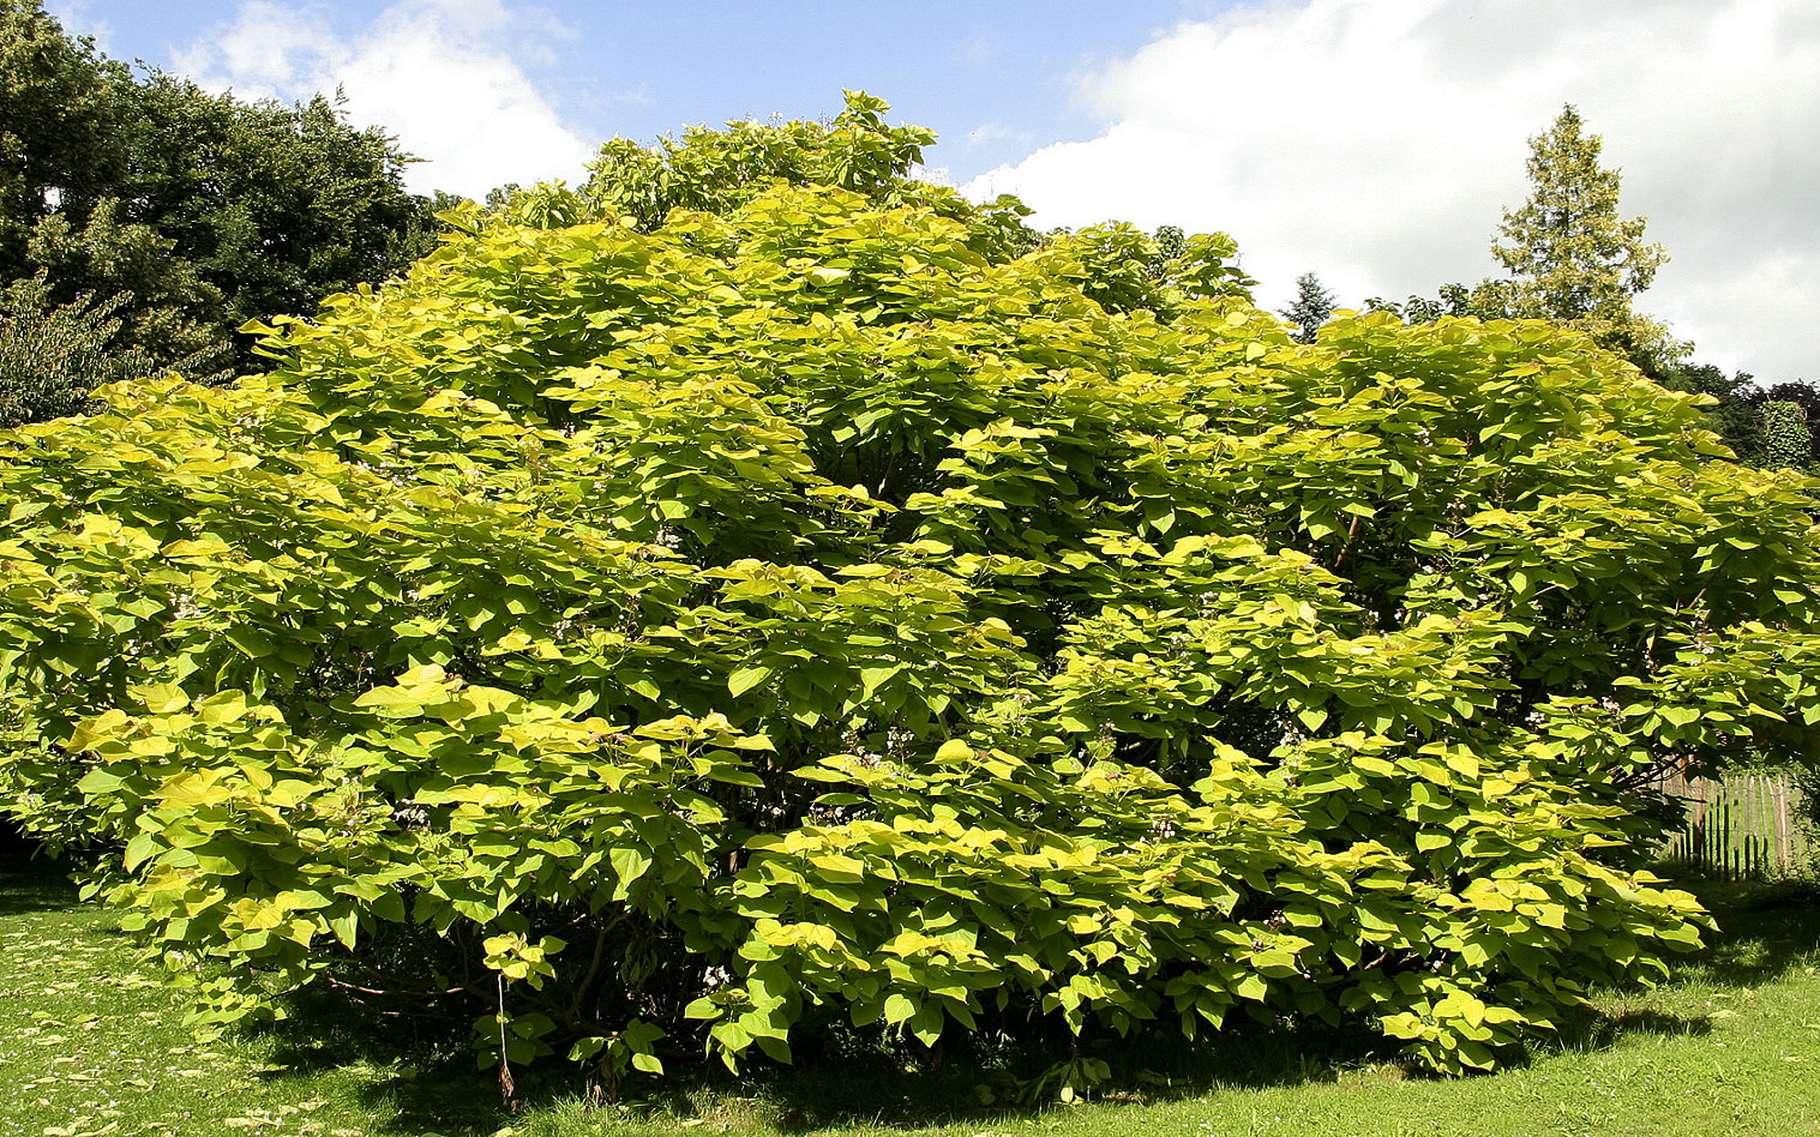 Le catalpa, arbre d'ornement. © pcgn7, Flickr 3.0 unported